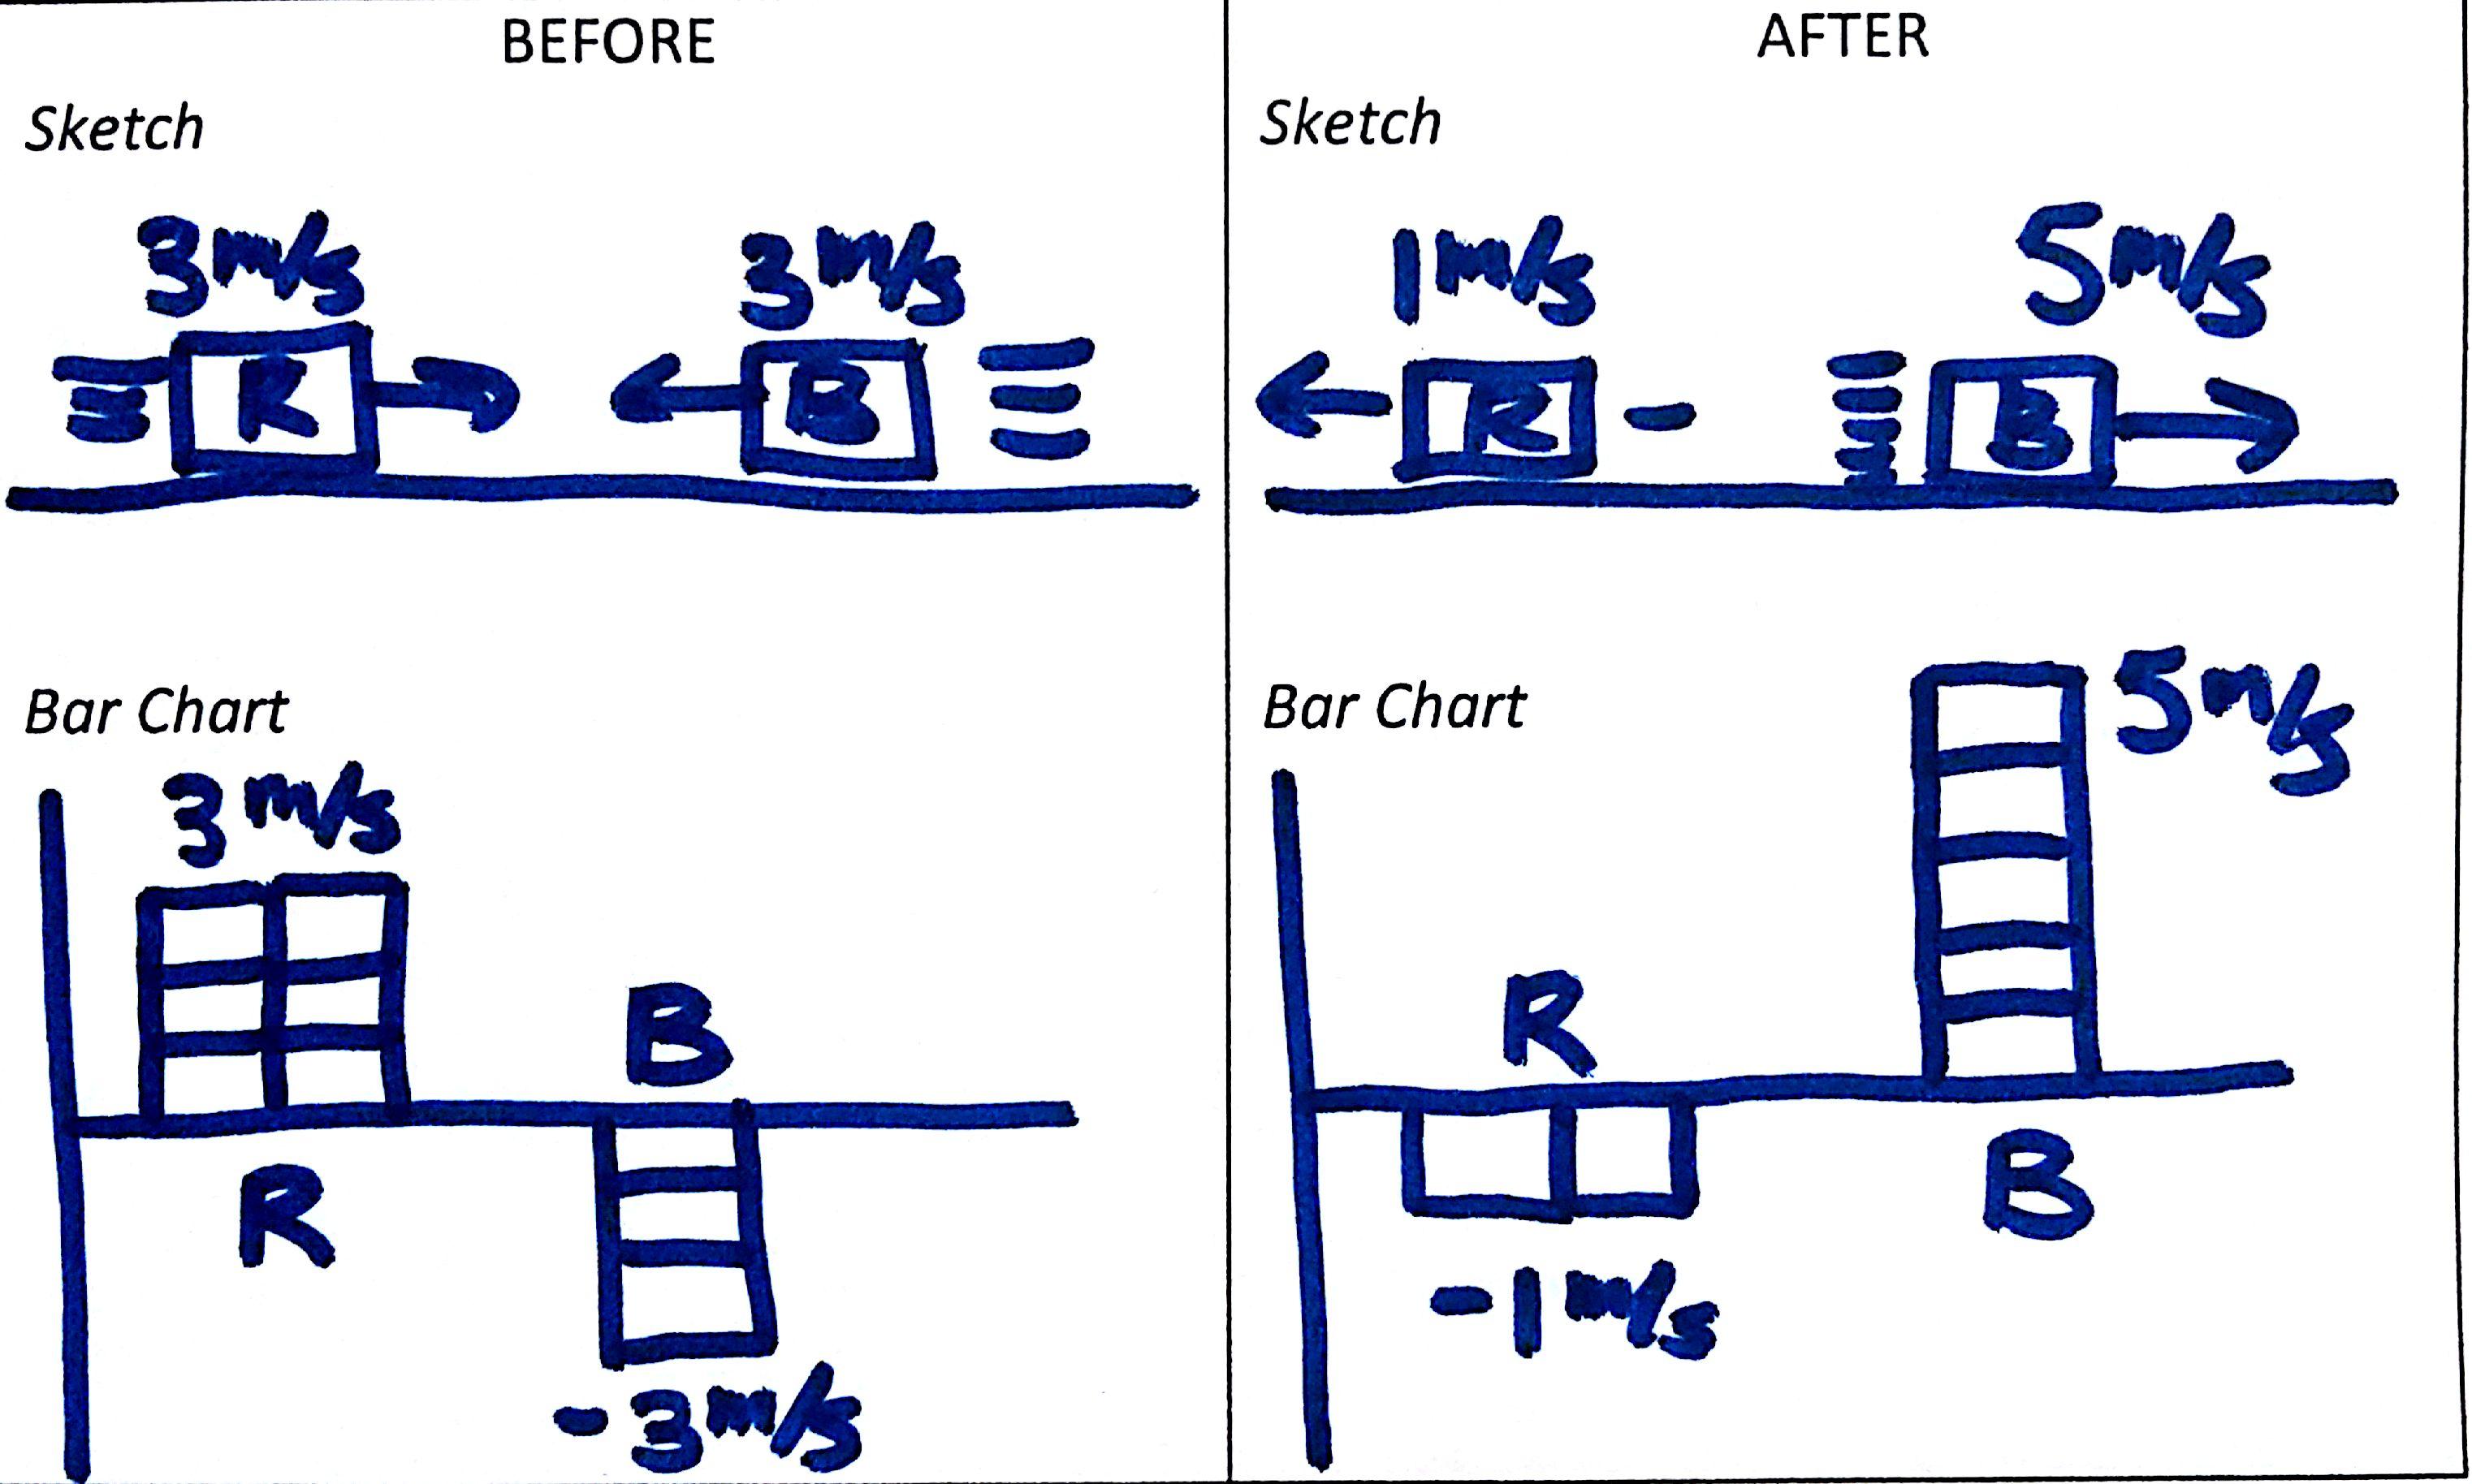 Day 63 Momentum Bar Graphs Vs Tables